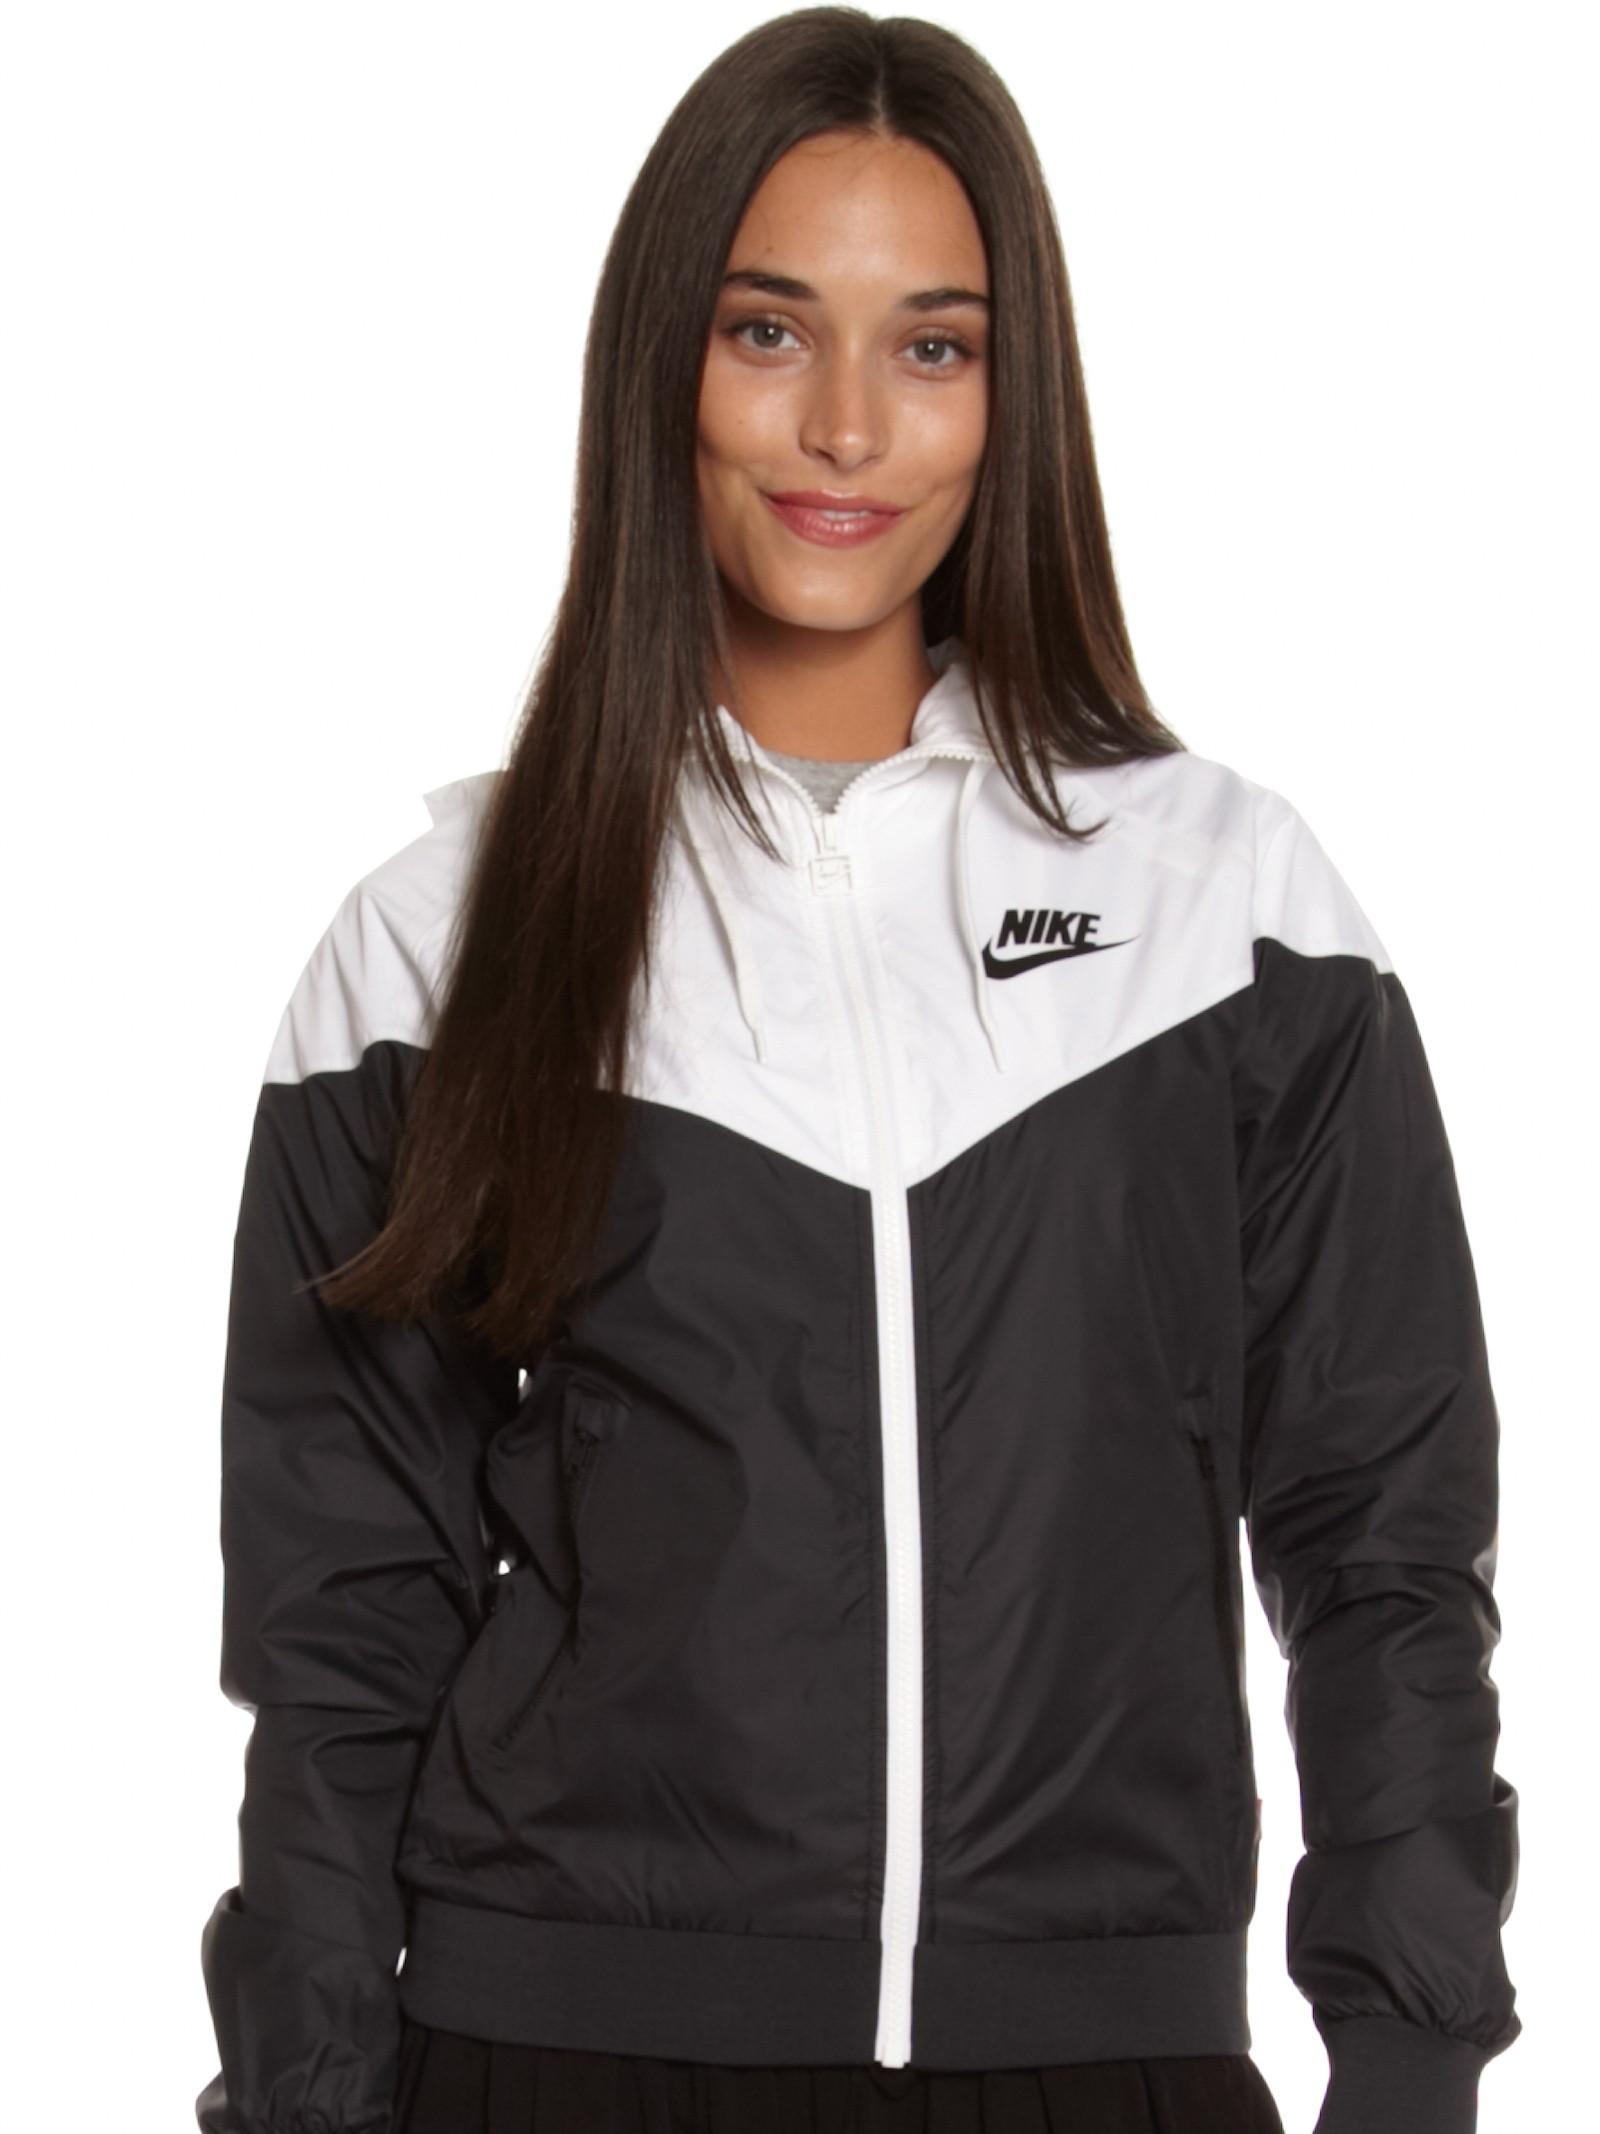 Nike Windrunner Jacket in Black \u0026 White